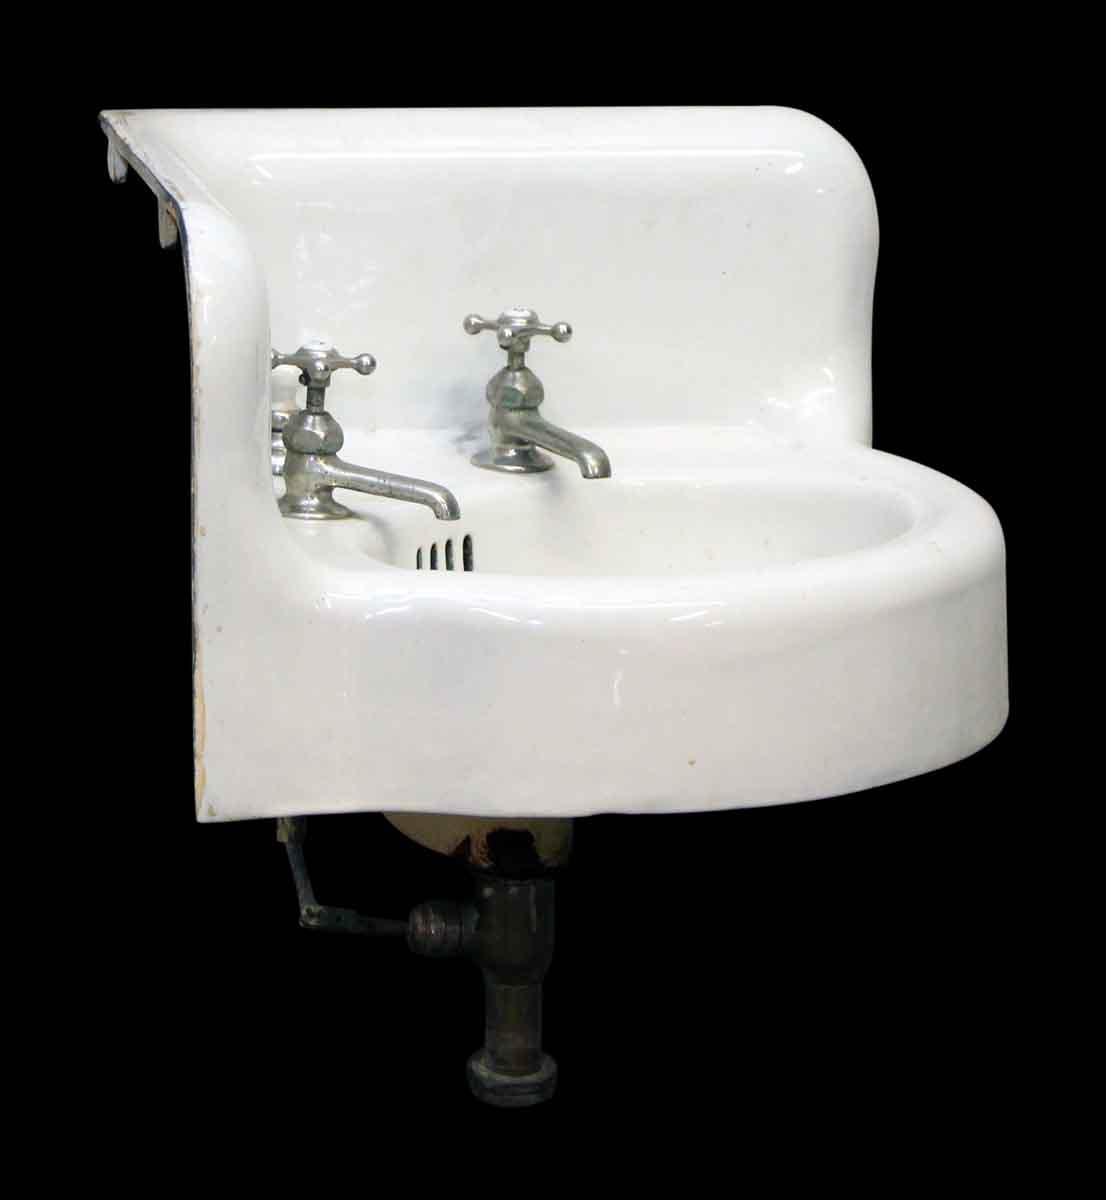 Porcelain Corner Sink With Original Hardware Olde Good Things